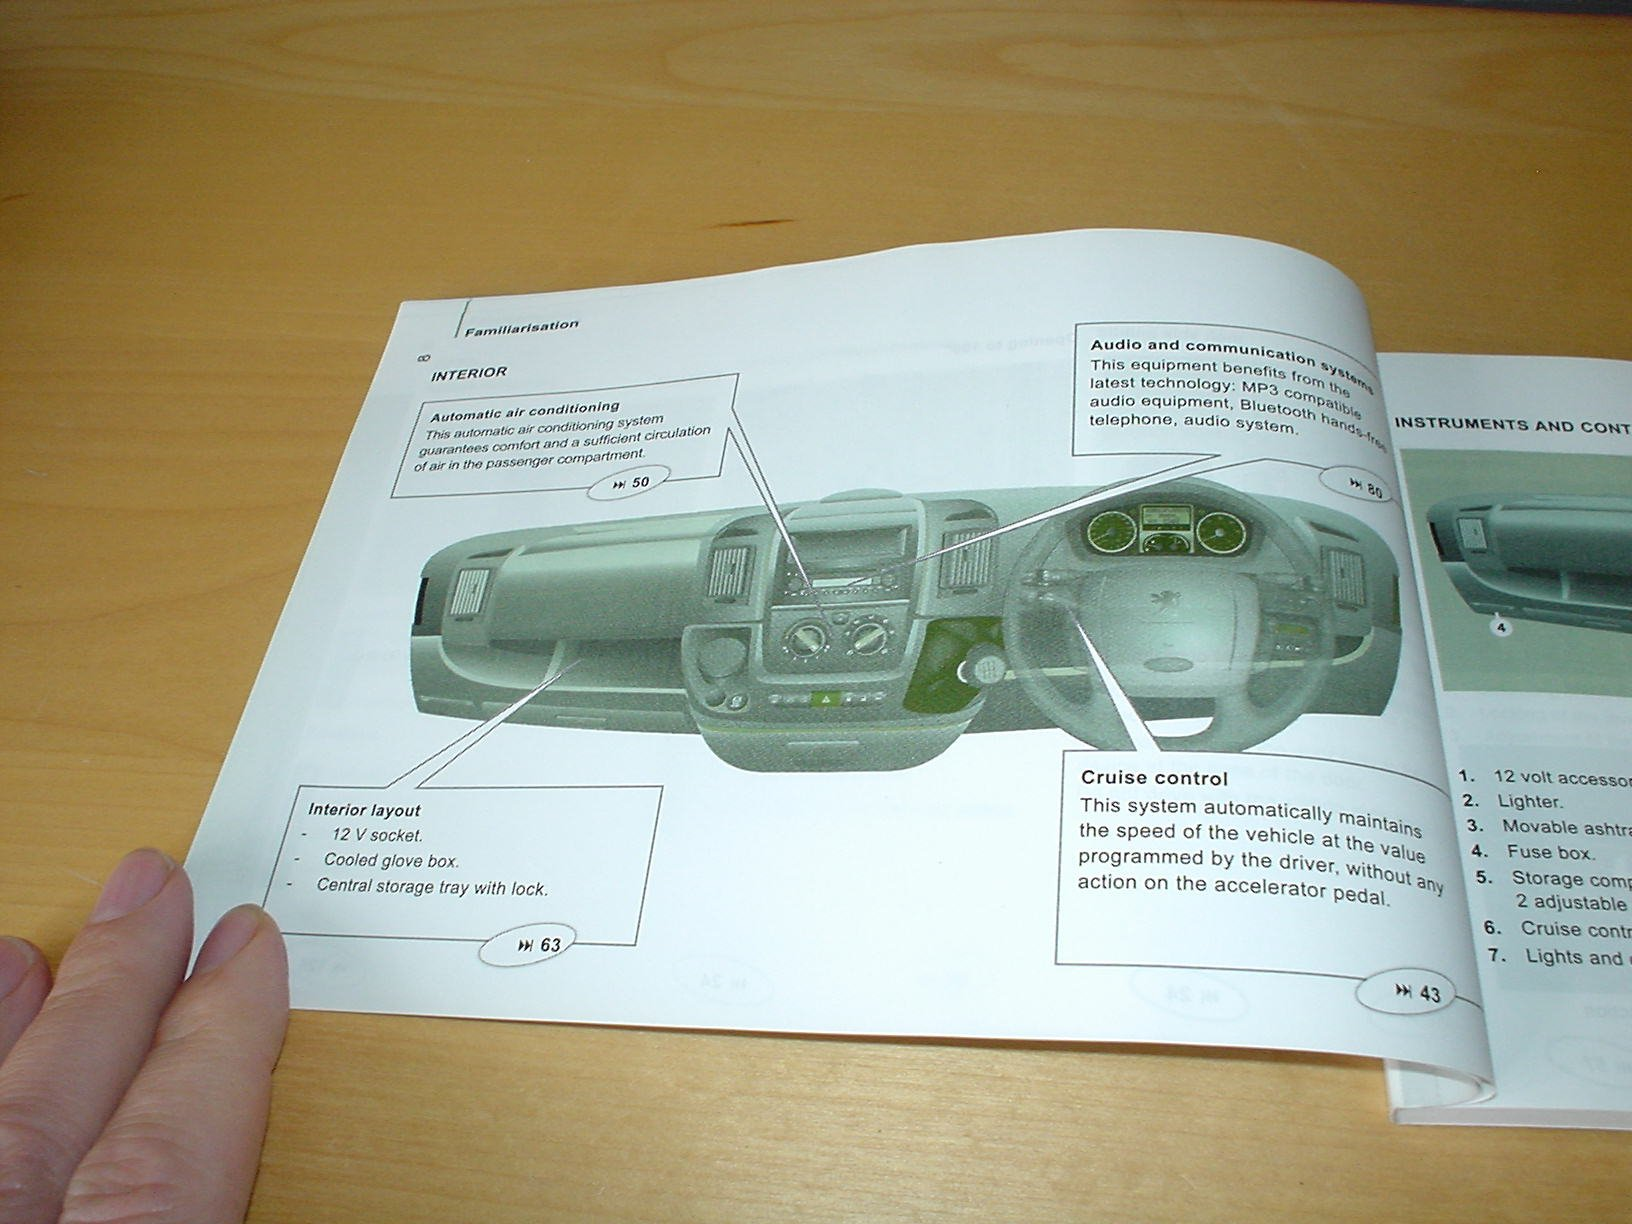 Peugeot Boxer Fuse Box Owners Manual Detailed Schematics Diagram 206 Van Handbook C W Wallet 2006 2011 2 3 0